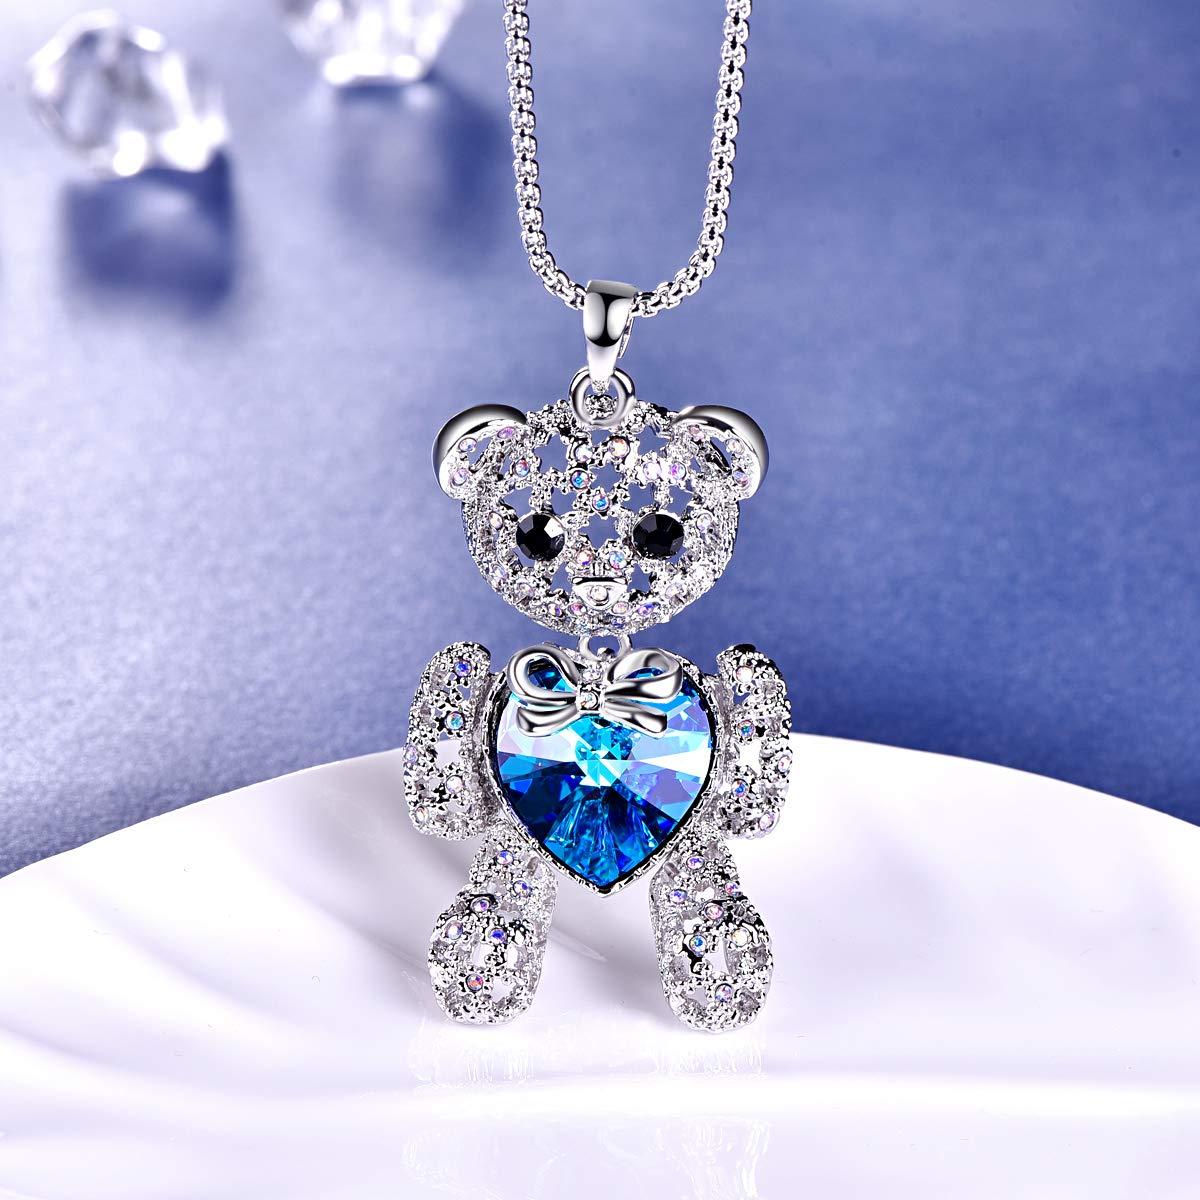 69ca0b76d Amazon.com: BONLAVIE Love Heart Pendant Necklace Sweater Long Chain 33